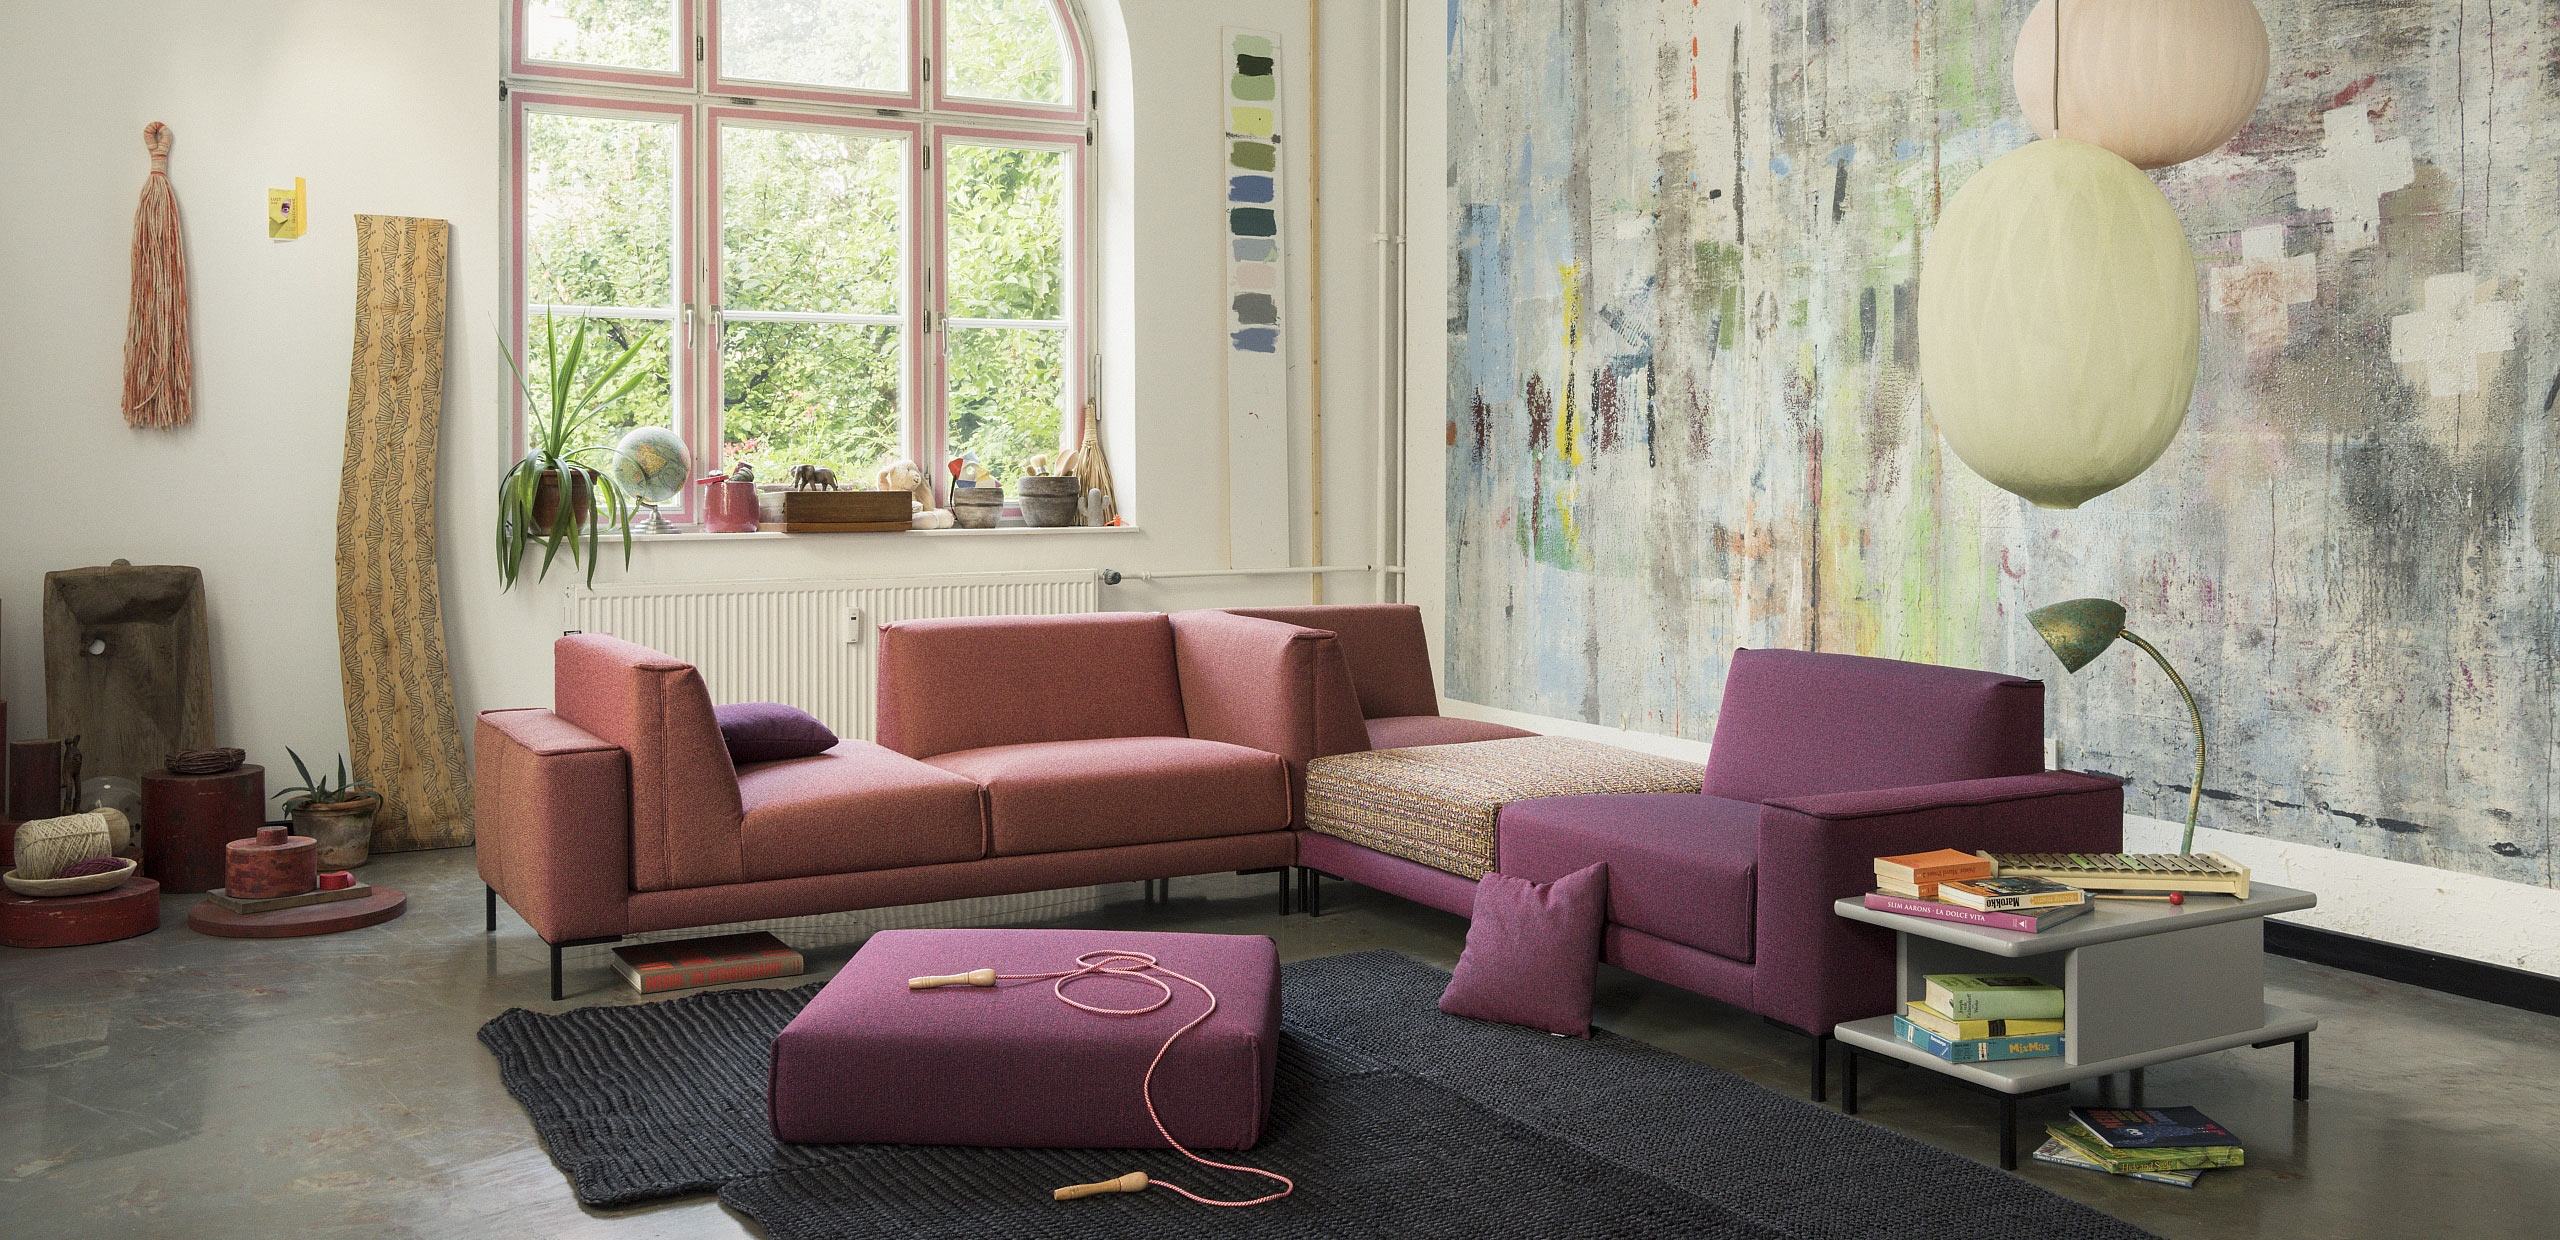 Full Size of Freistil Rolf Benz Bett Ausstellungsstück Sofa Küche Wohnzimmer Freistil Ausstellungsstück